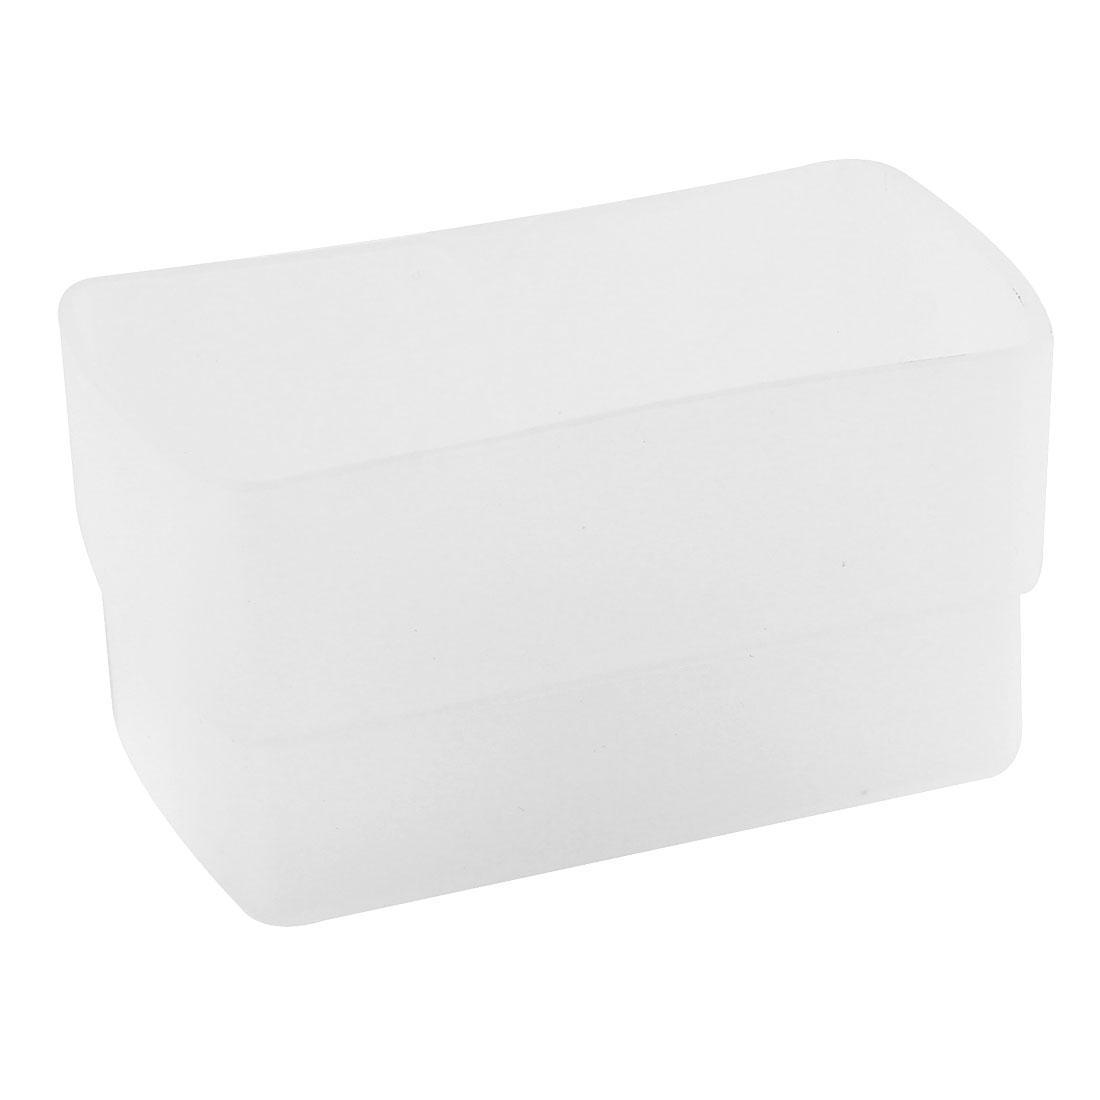 Soft Box Flash Diffuser White Bounce Softbox Cover for Canon 550EX